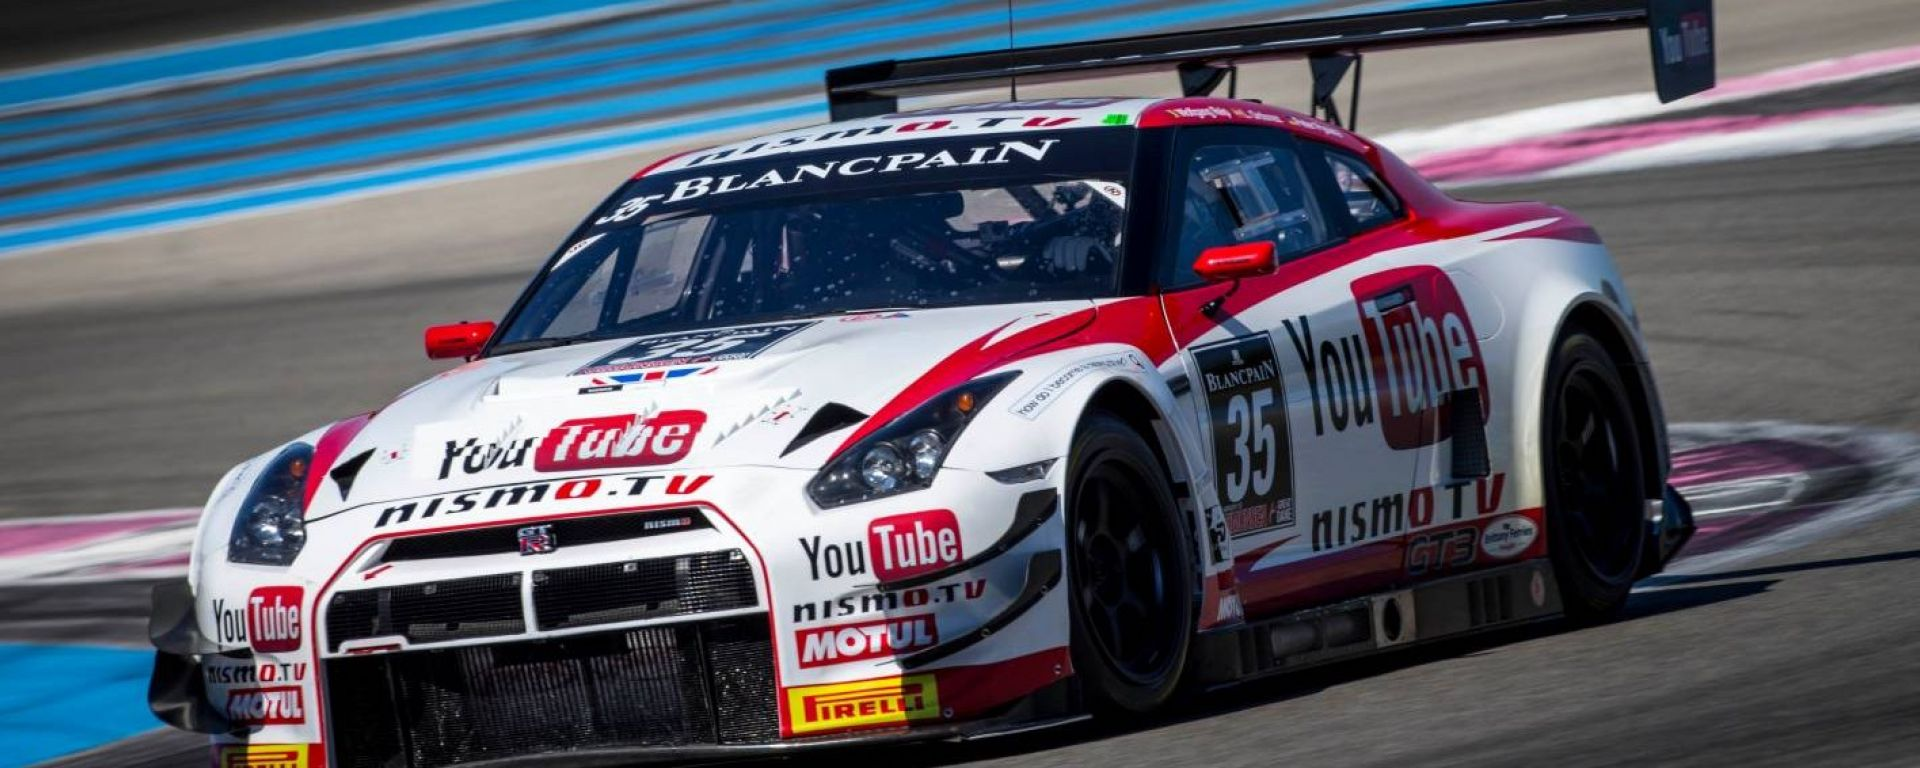 Campionato GT Italiano 2017: Drive Technology